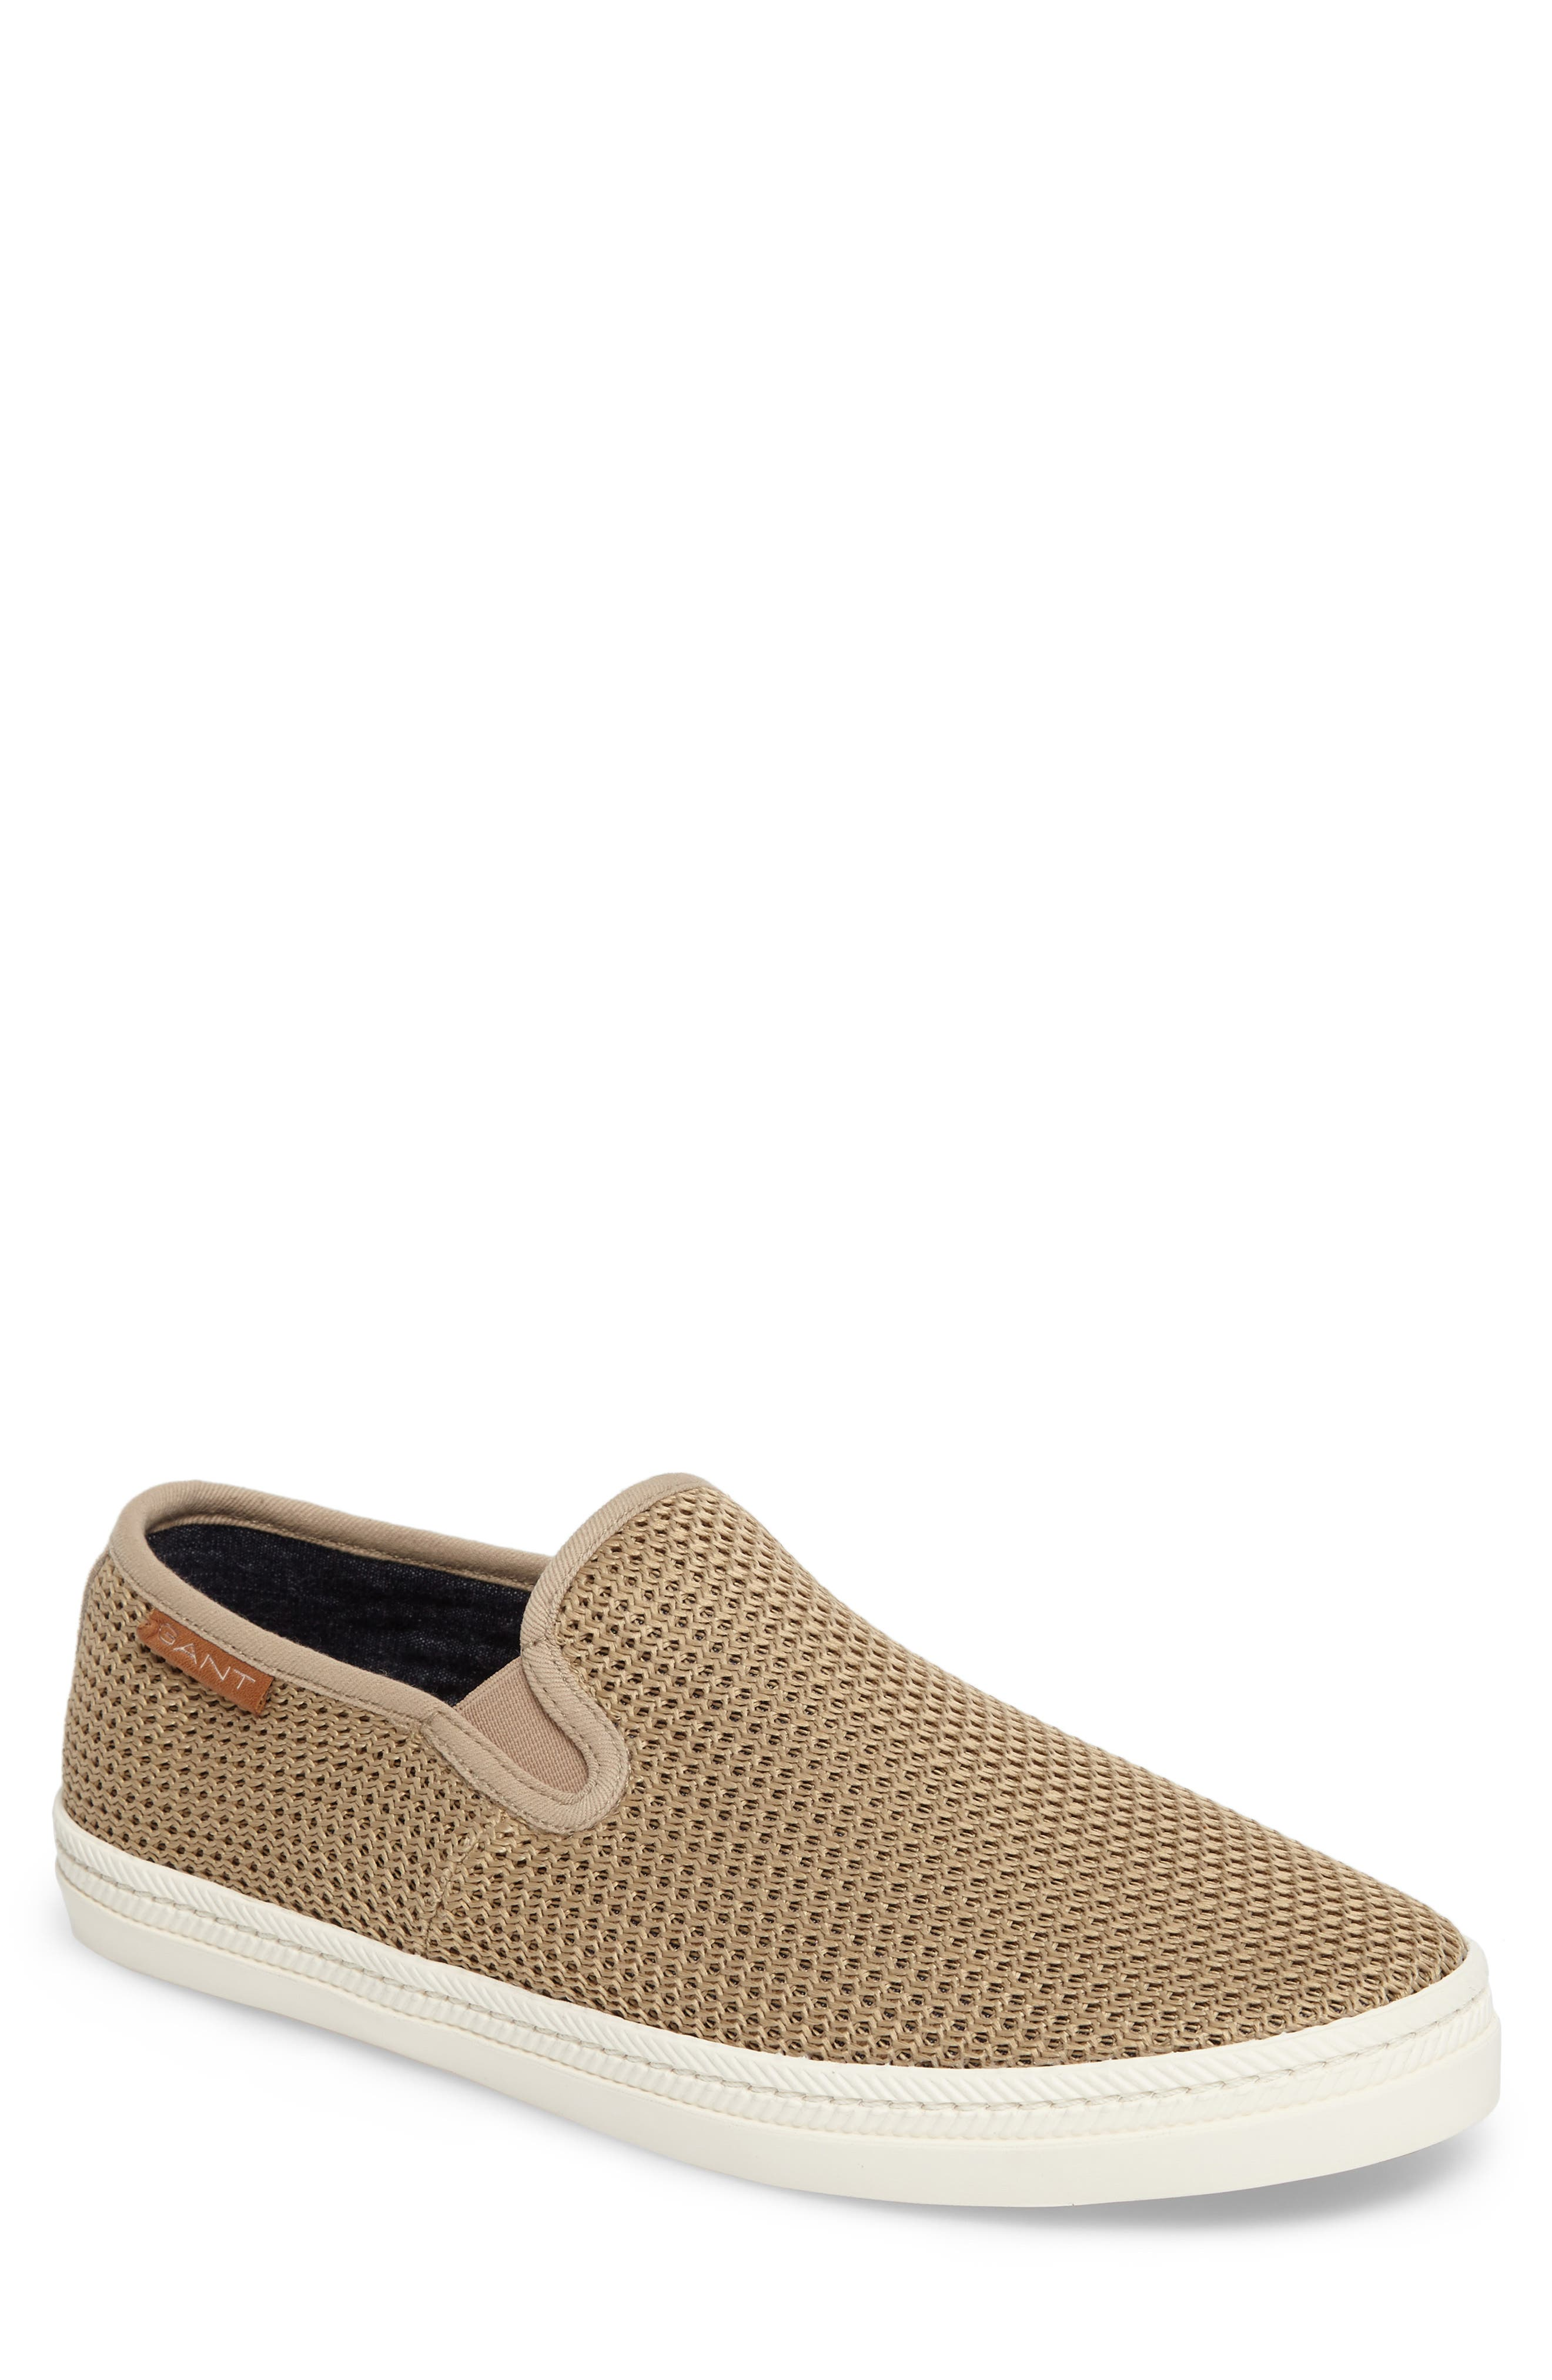 Delray Woven Slip-On Sneaker,                         Main,                         color, 252